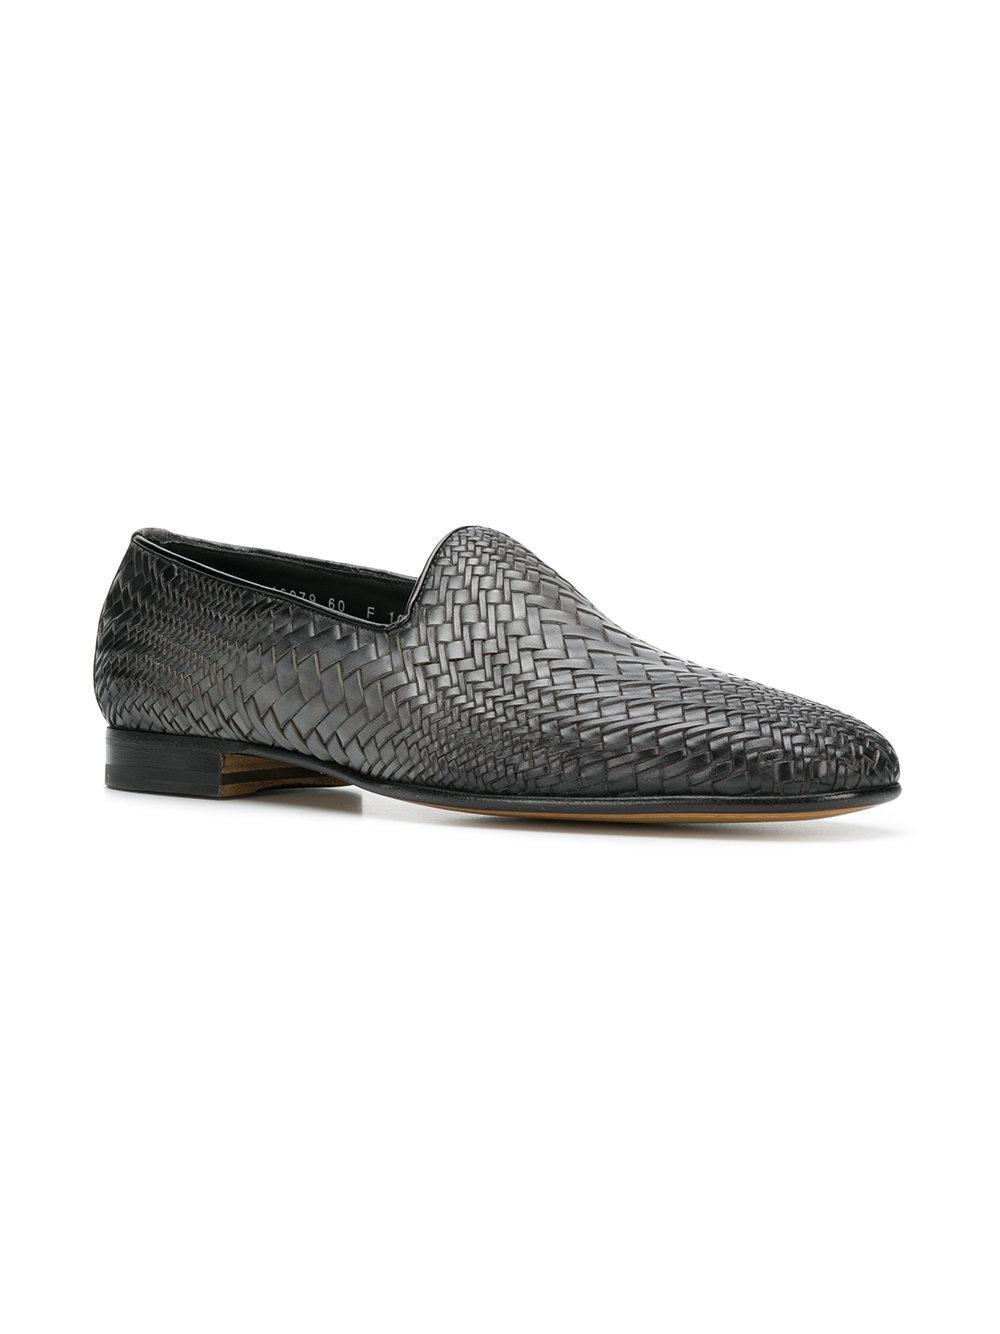 Santoni faded woven loafers deals online 4roCUX